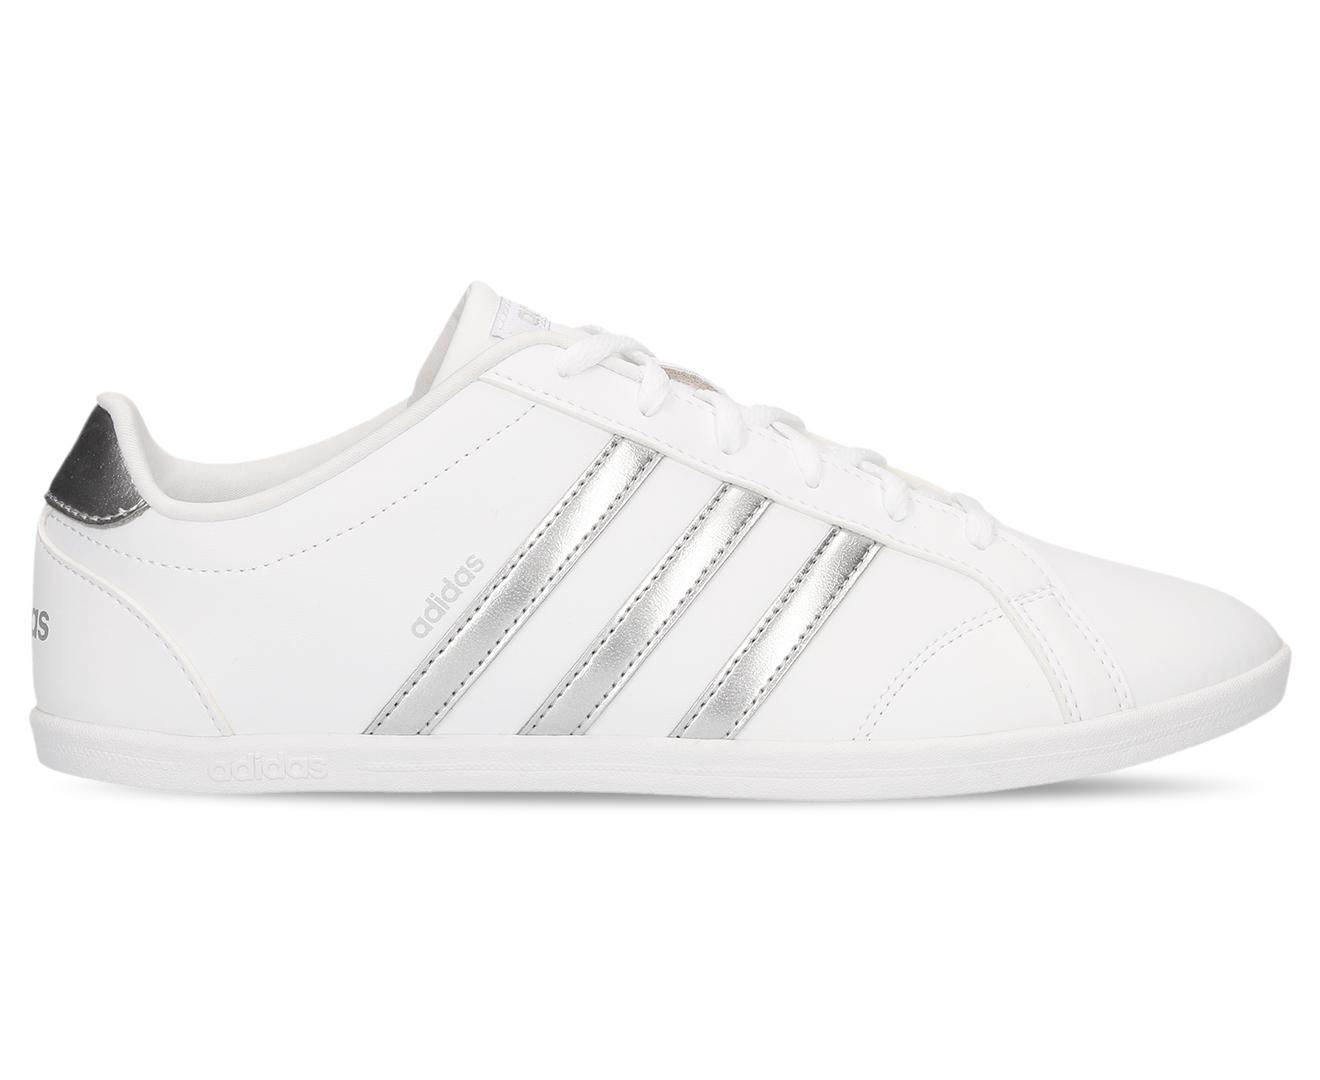 Adidas Women's Coneo QT Shoe Footwear WhiteMetallic Silver